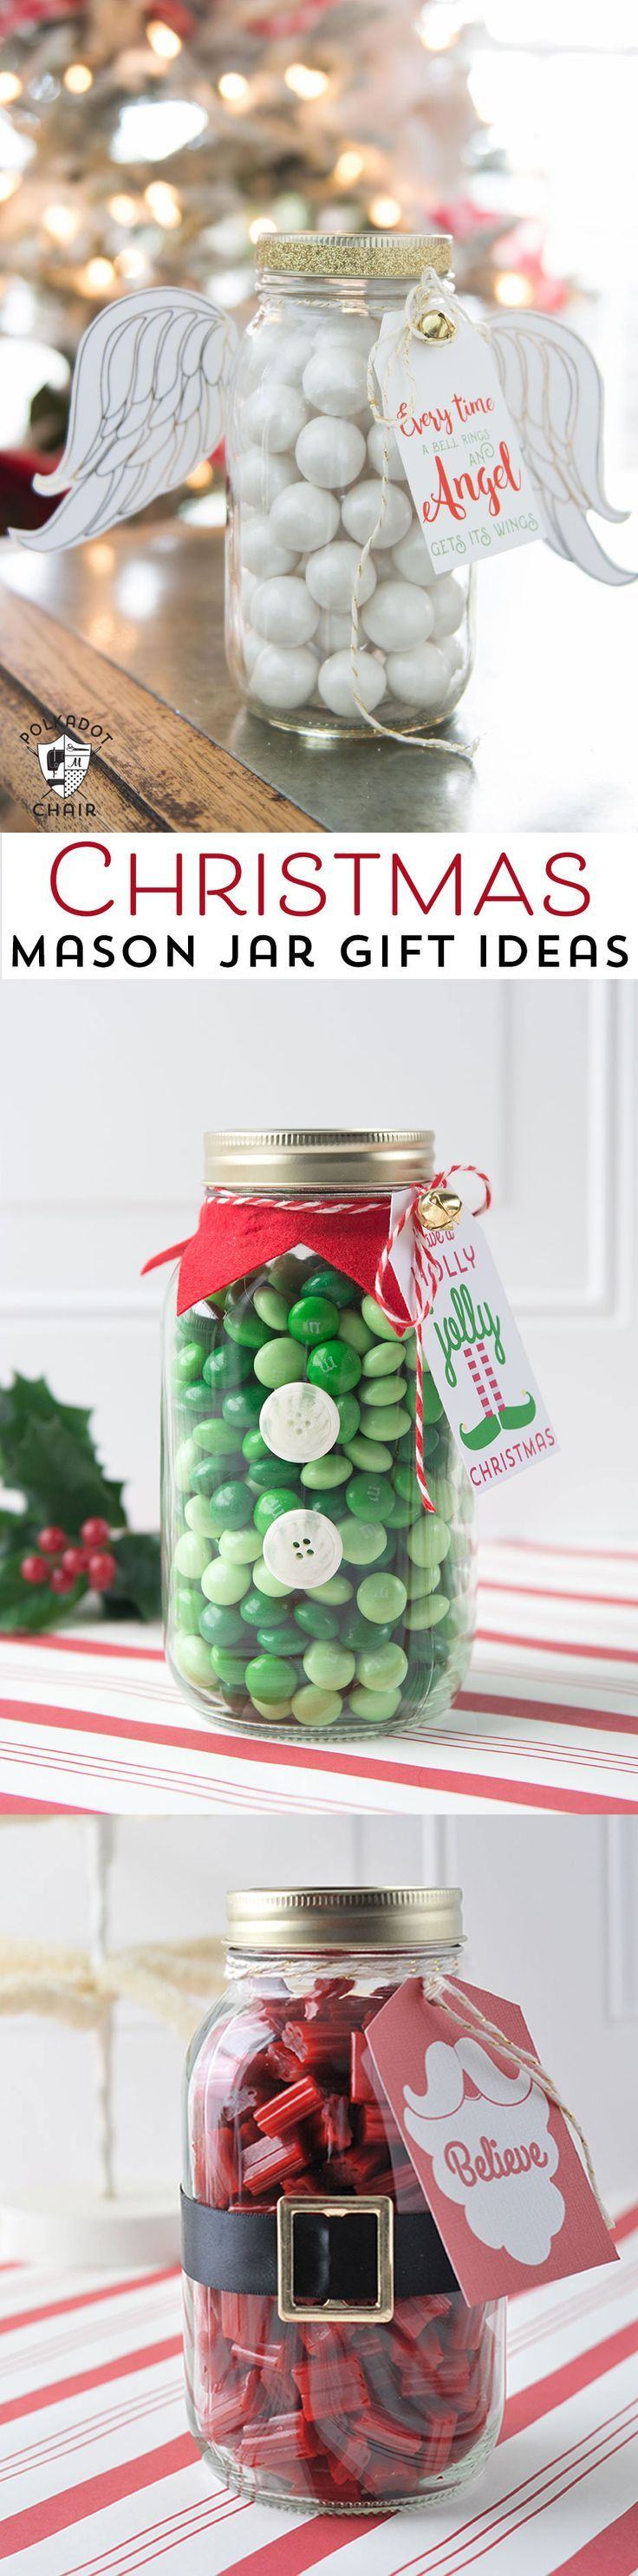 Cute Angel Christmas Mason Jar Gift Ideas and printable Christmas tags and angel wings on polkadotchair.com #christmas #christmasgifts #christmasmasonjar #masonjar #masonjargifts #christmastags